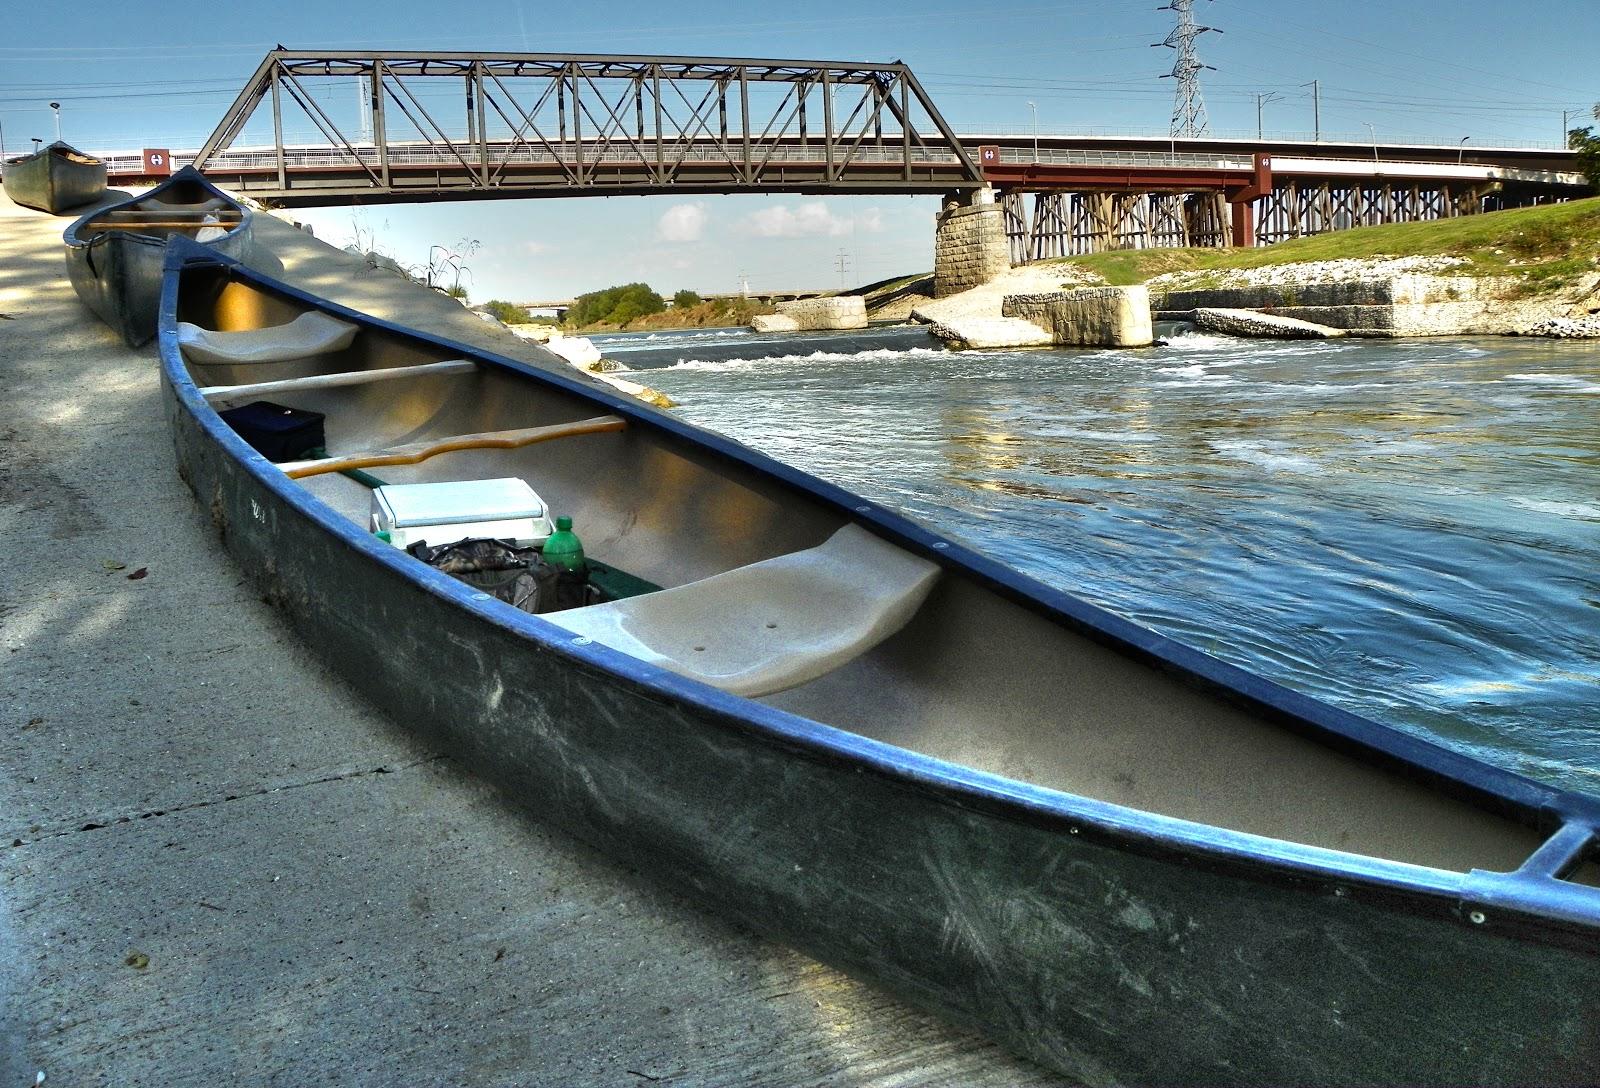 Dallas Trinity Trails Exploring The Trinity River By Canoe The